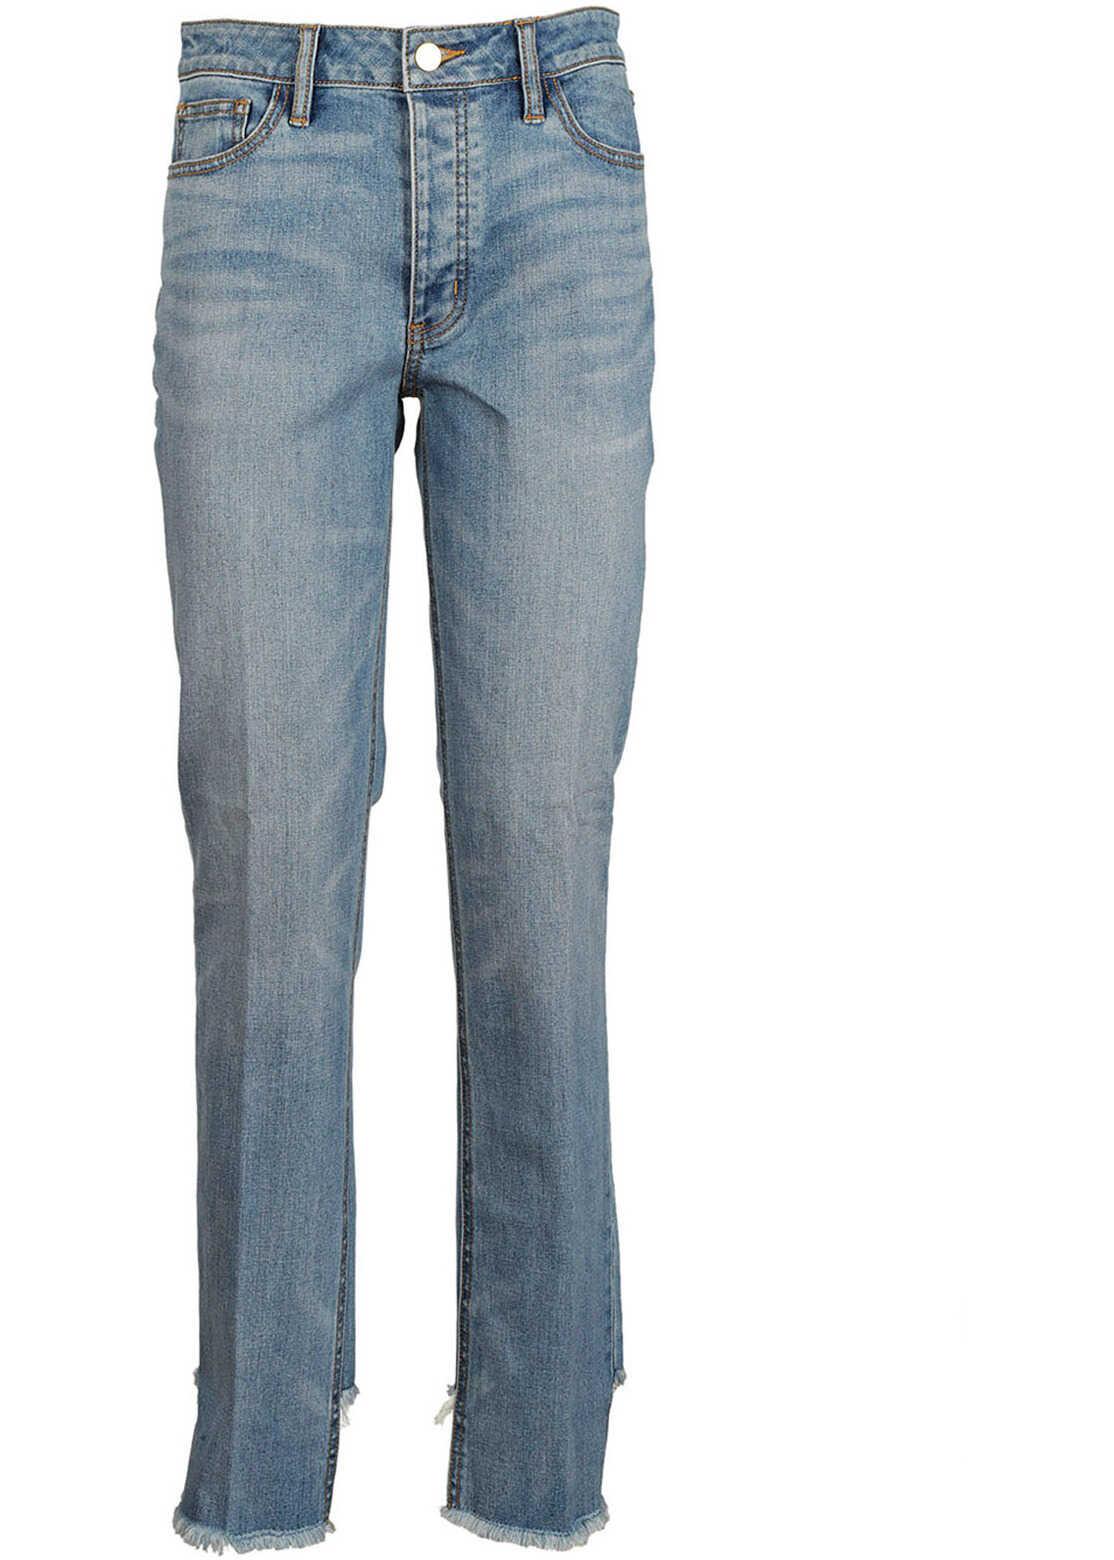 Tory Burch Strechthose Jeans Blue